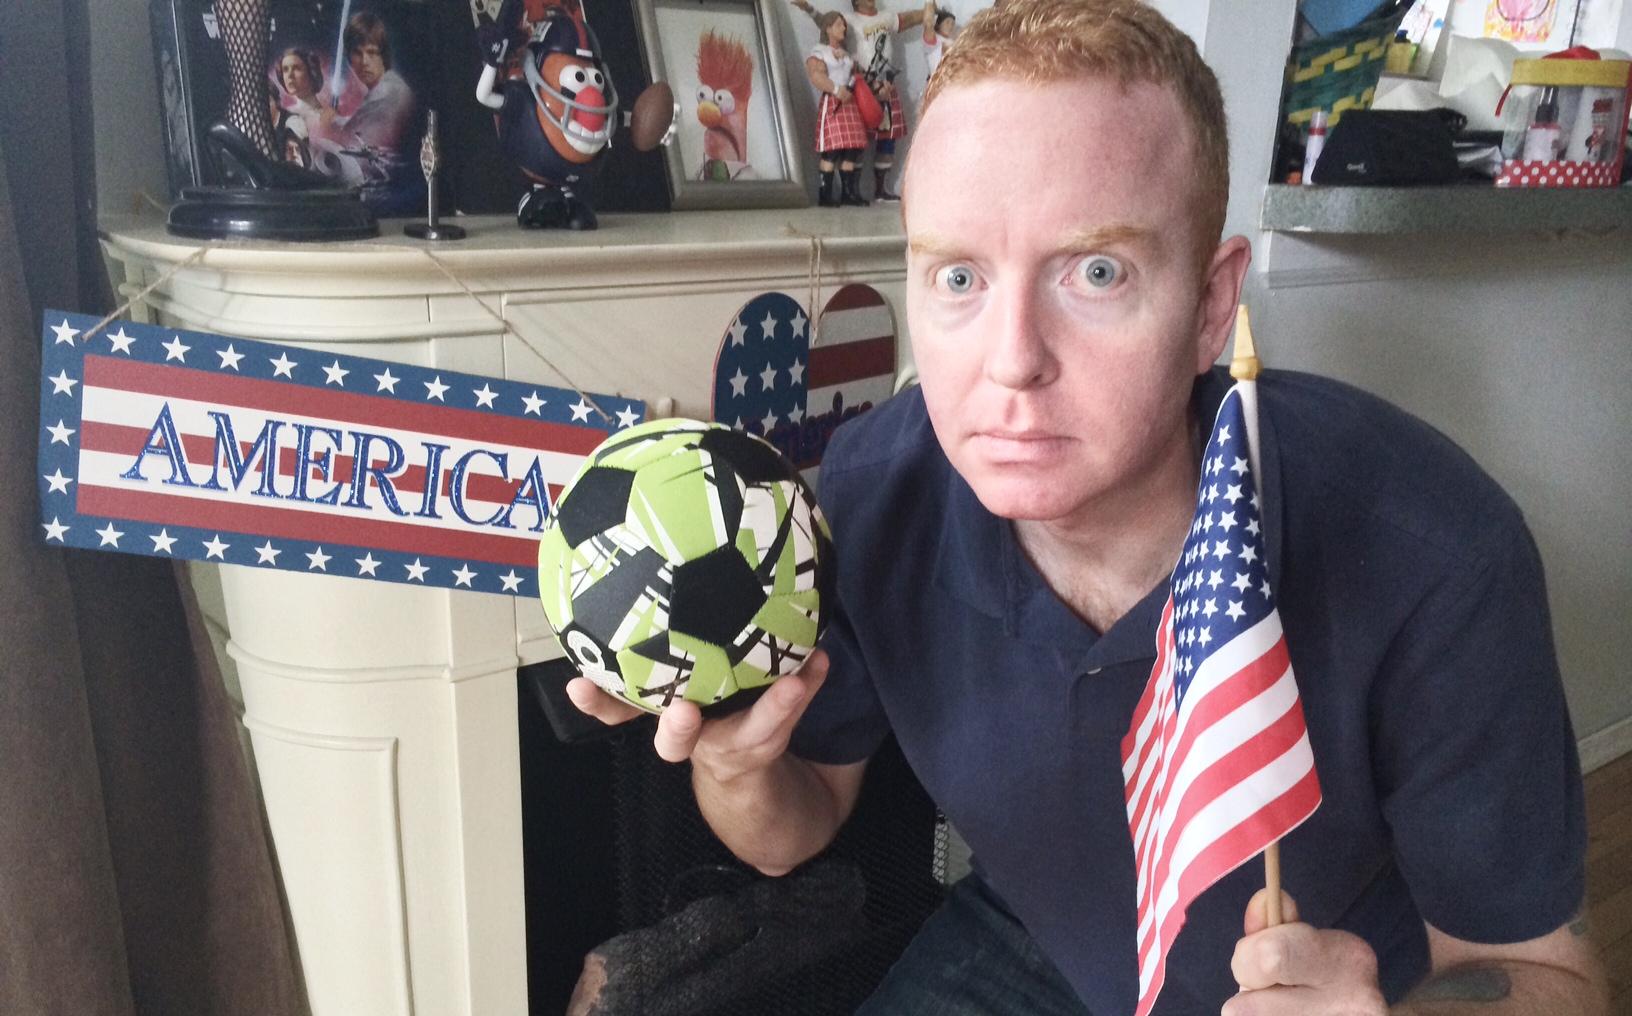 Beardless Dave America World Cup.jpeg